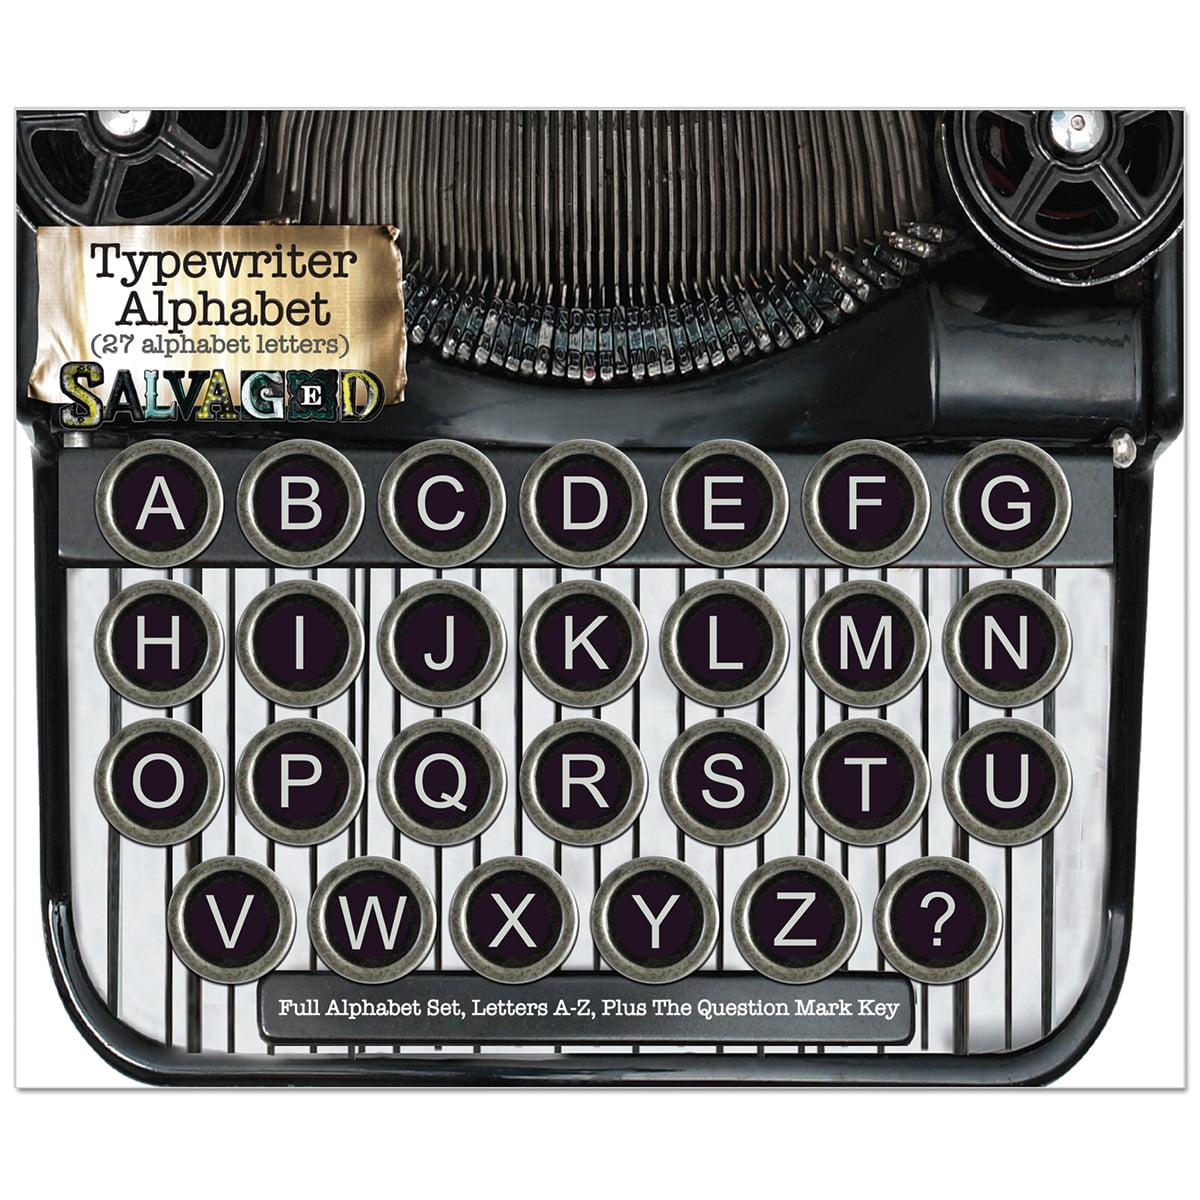 Salvaged Vintage Typewriter Keys-Alphabet - image 1 of 1